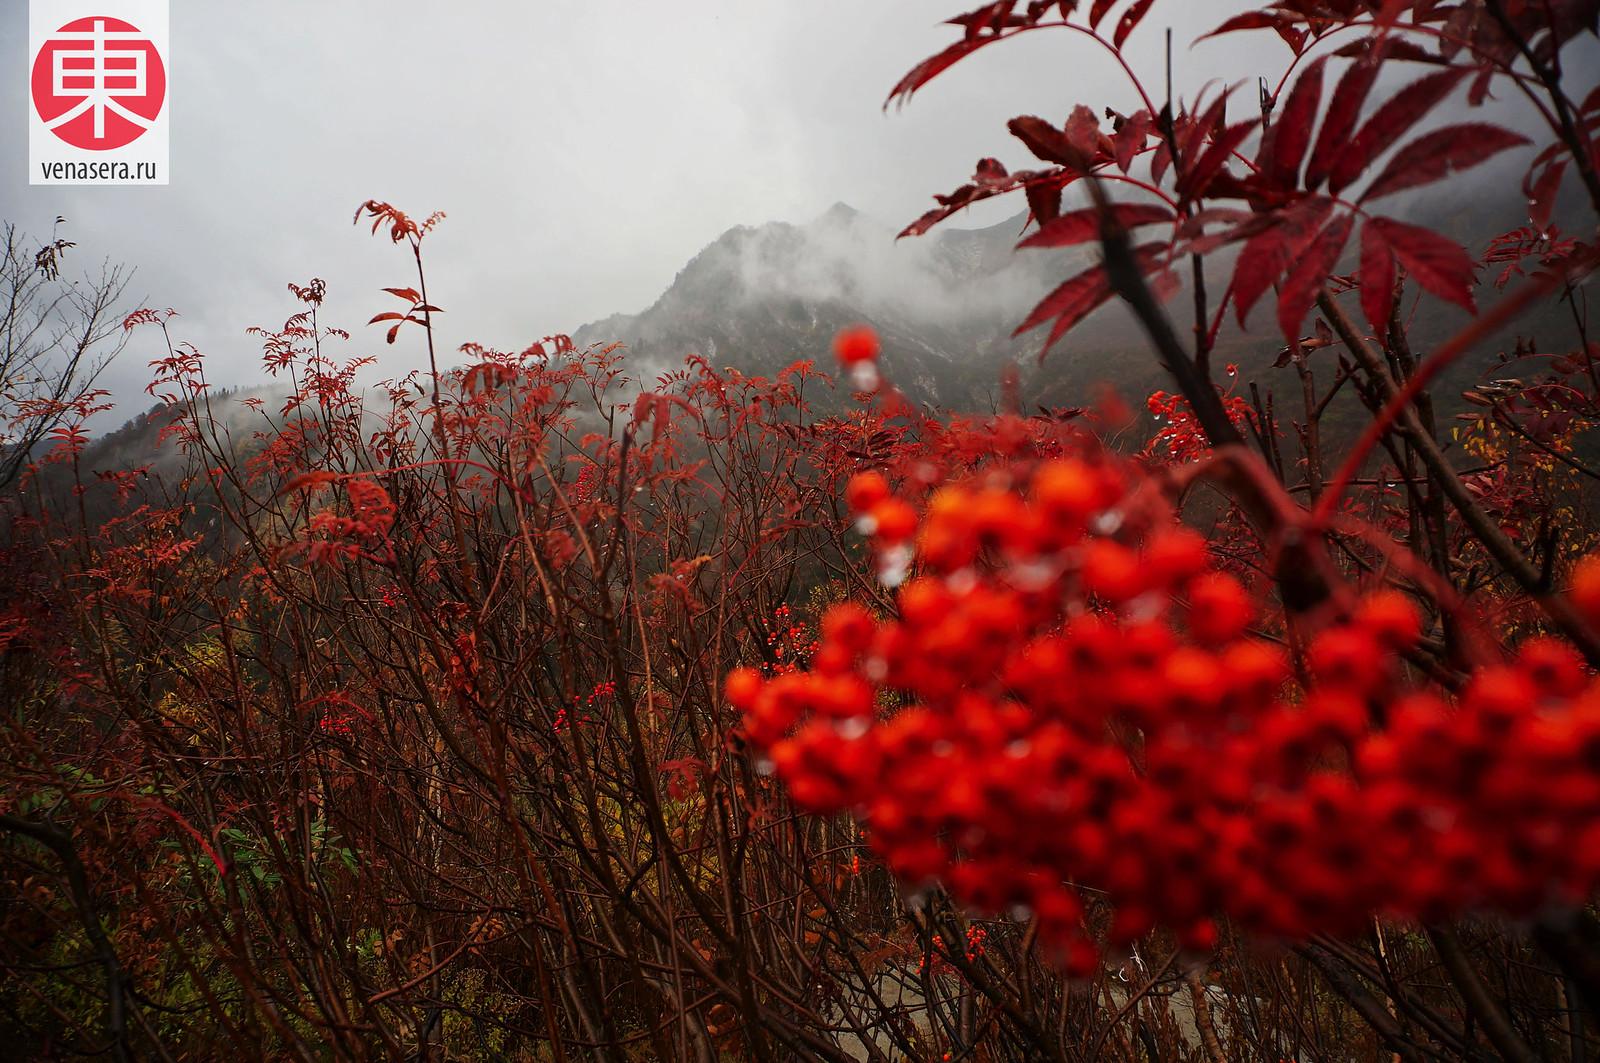 Куробэдайра (黒部平), Японские Альпы Татэяма Куробэ, Татэяма Куробэ, Tateyama Kurobe Alpine Route, 立山黒部, 立山黒部アルペンルート